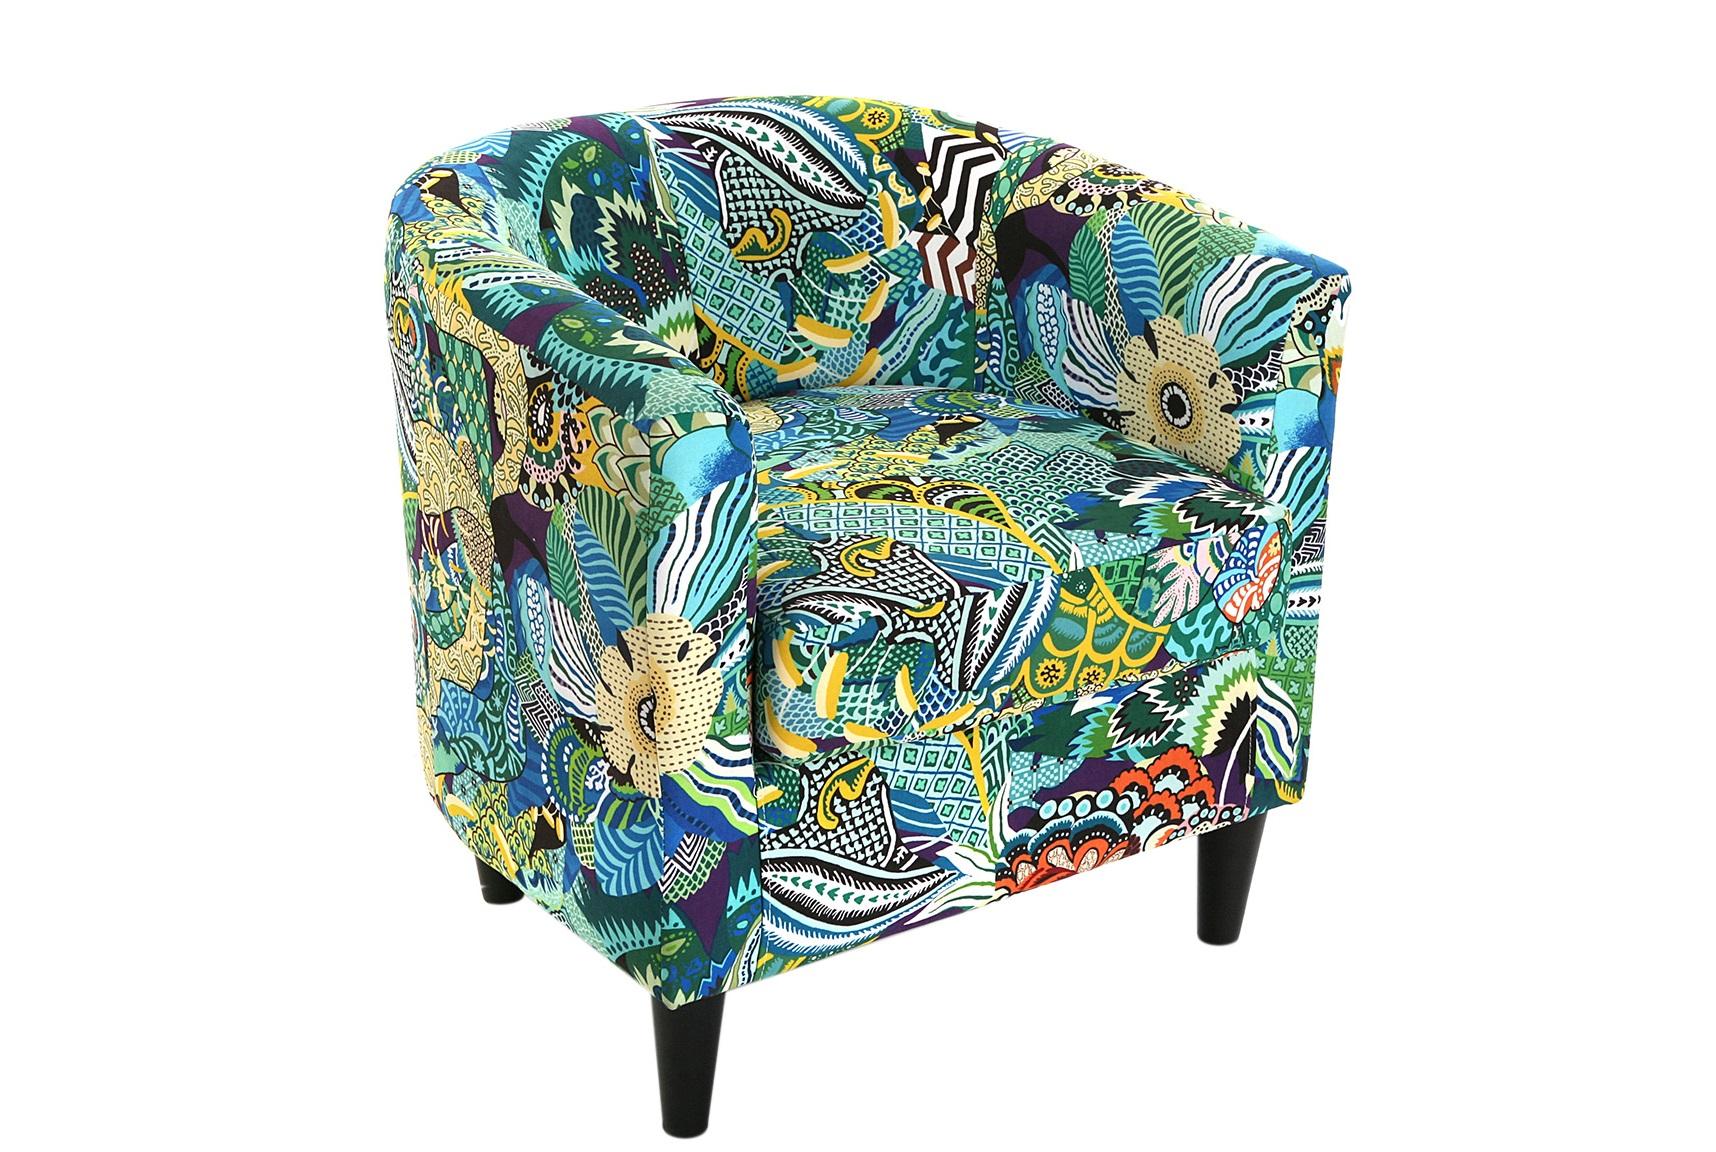 Кресло Tropical PatchworkИнтерьерные кресла<br><br><br>Material: Текстиль<br>Length см: None<br>Width см: 62<br>Depth см: 64<br>Height см: 56